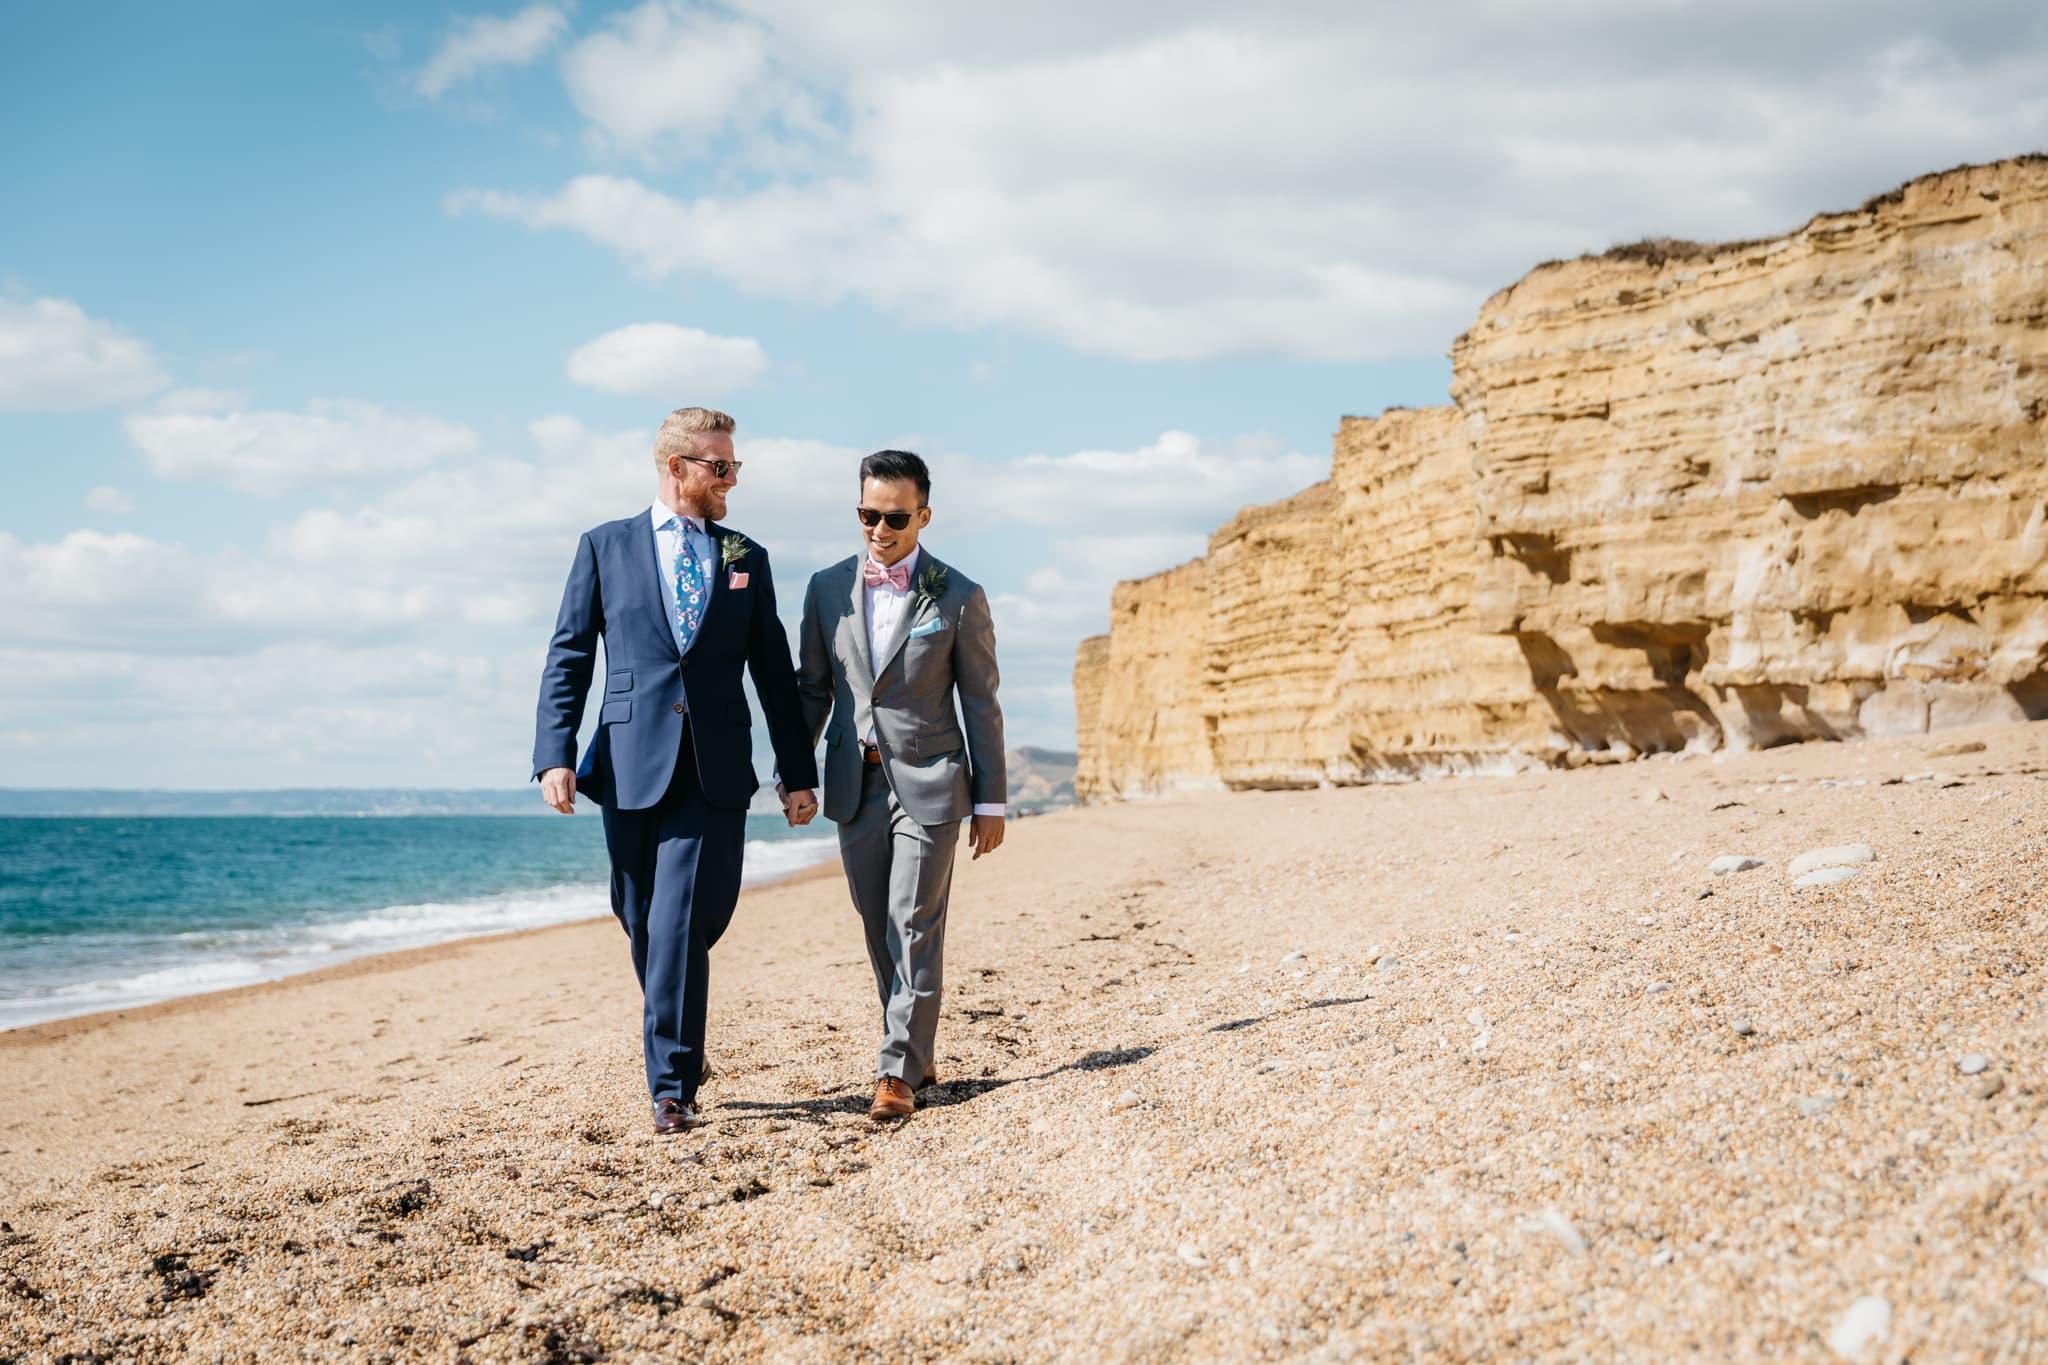 Same sex couple walking along the beach to their wedding